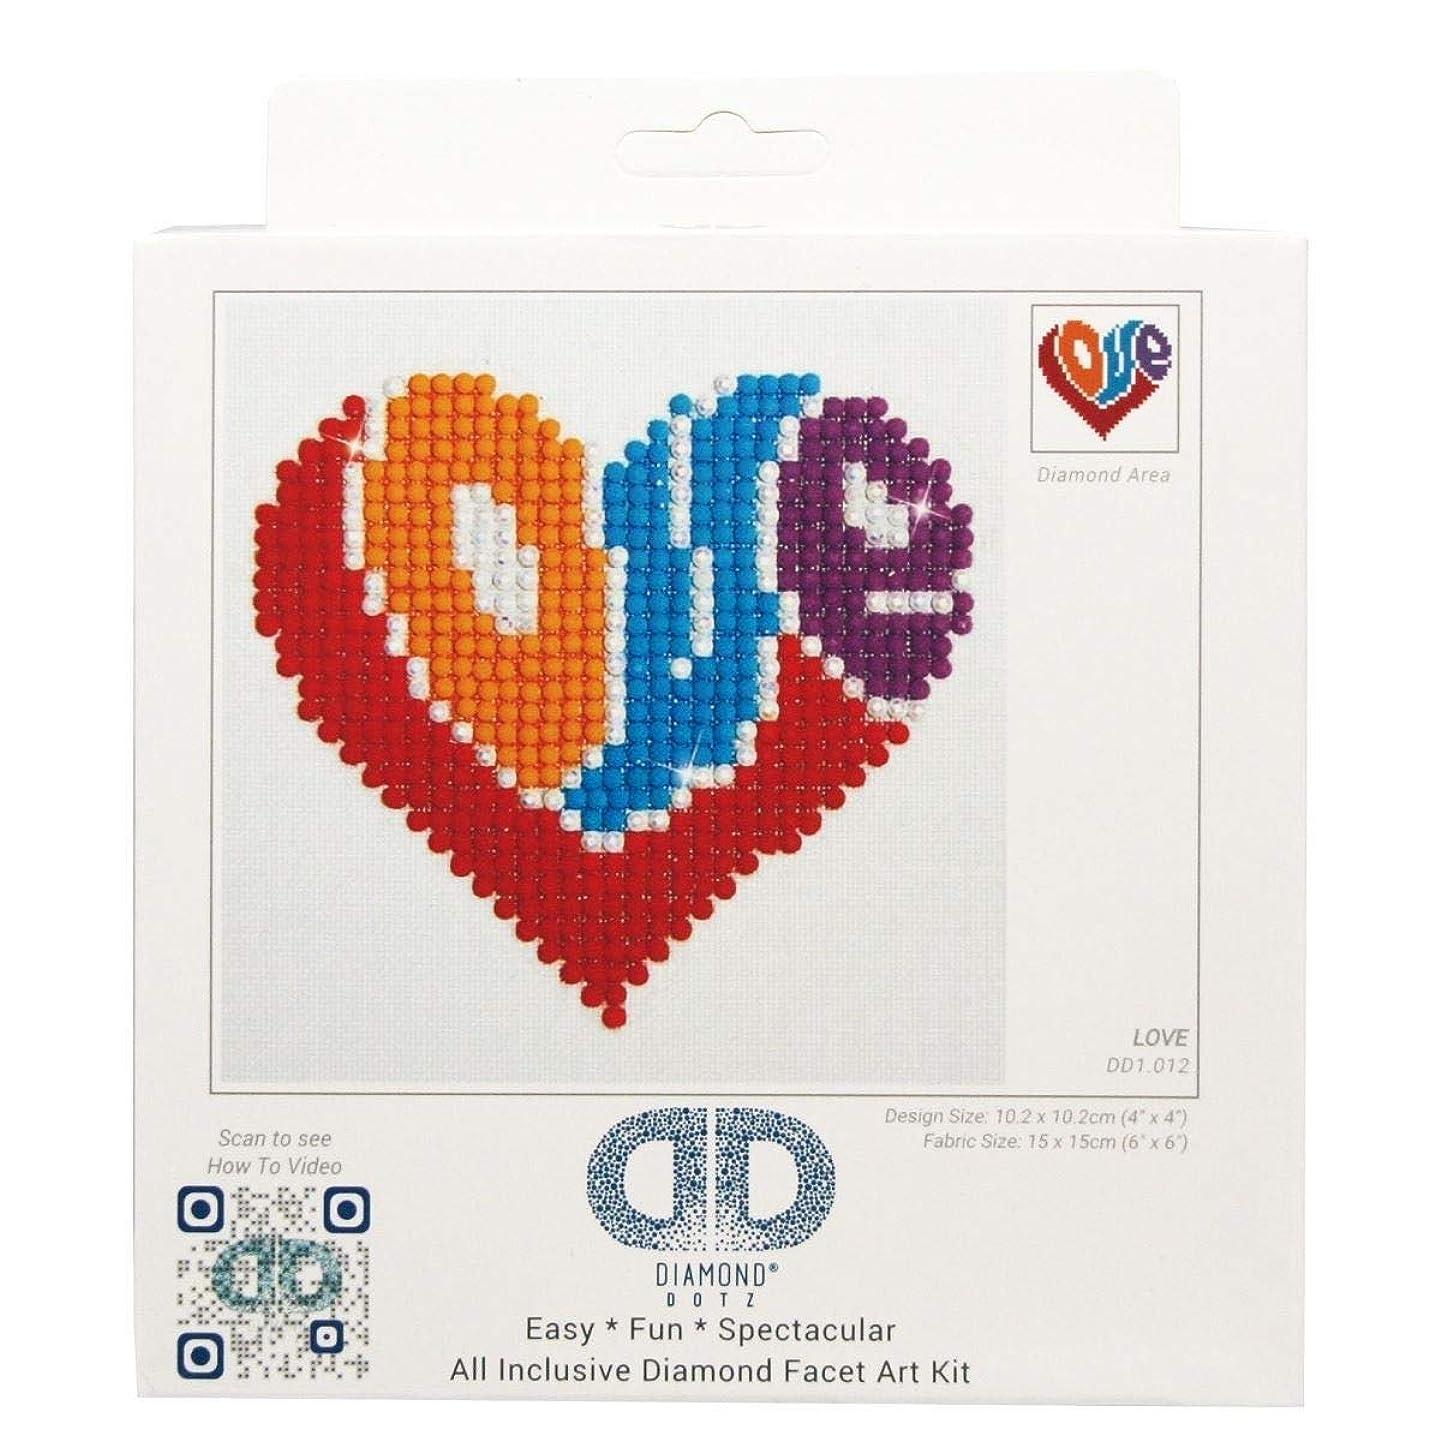 Needleart World Love Diamond Embroidery Kit, None